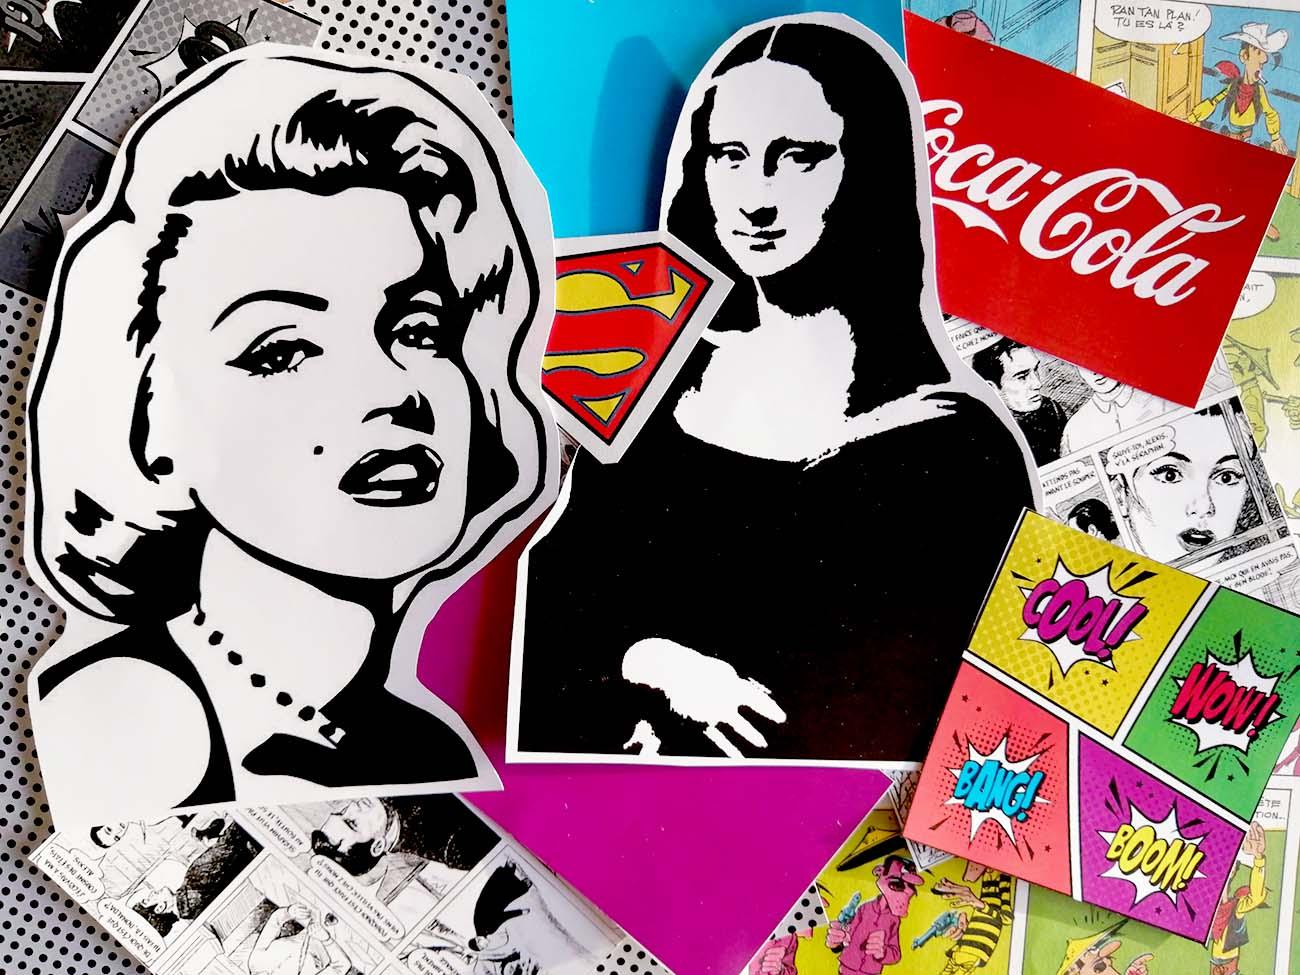 Tuto Collage Pop Art Et Street Art